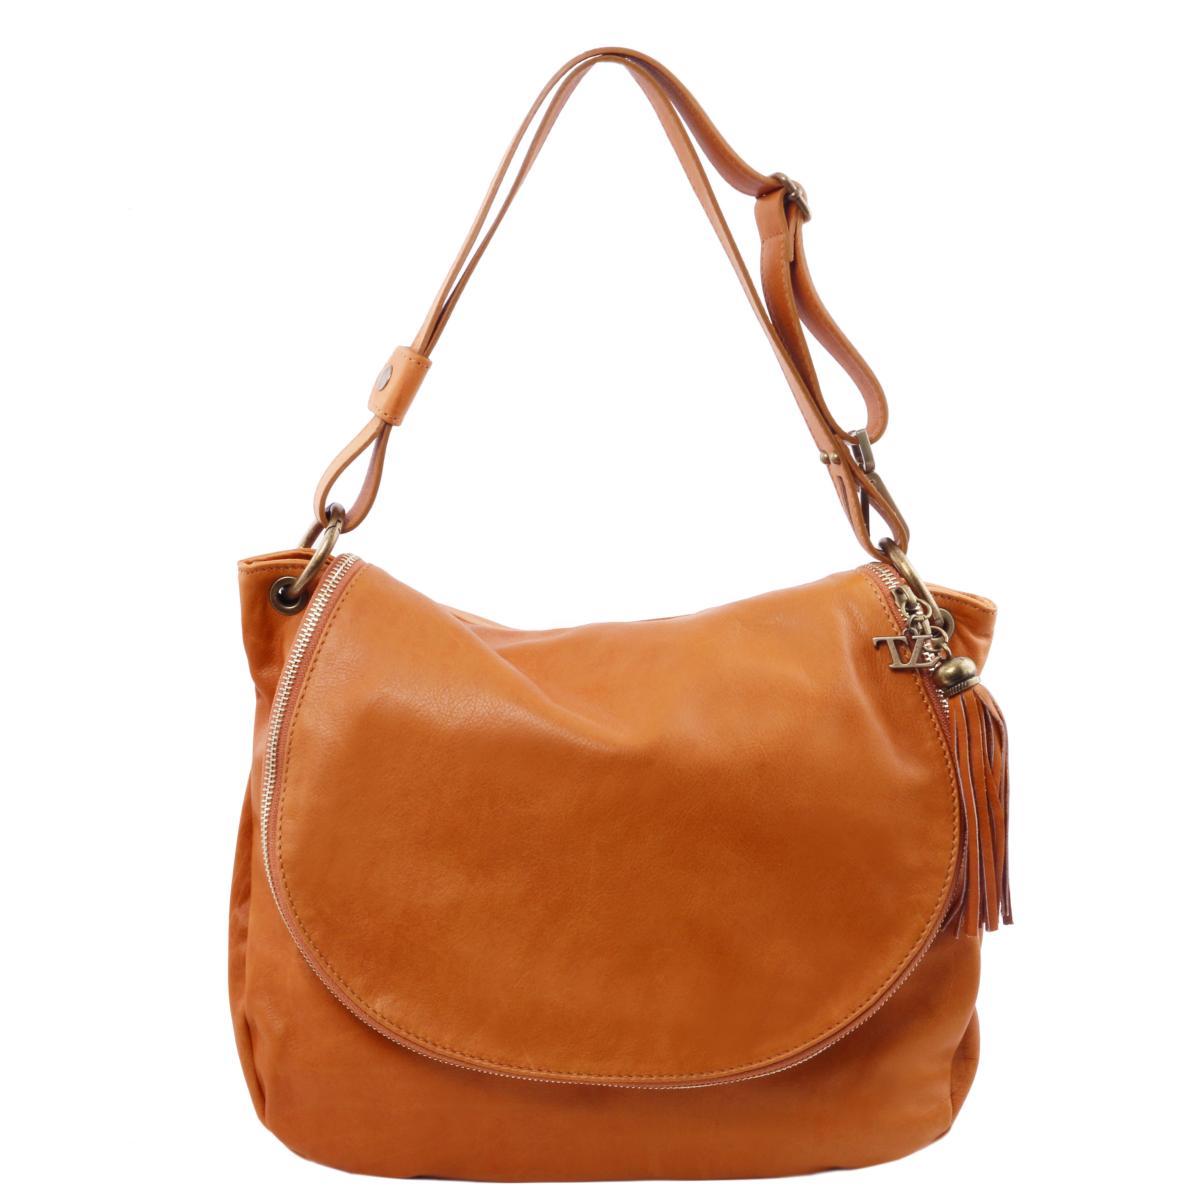 regarder 50b89 21357 Grand Sac Cuir Bandoulière Besace Femme Camel - Tuscany Leather -